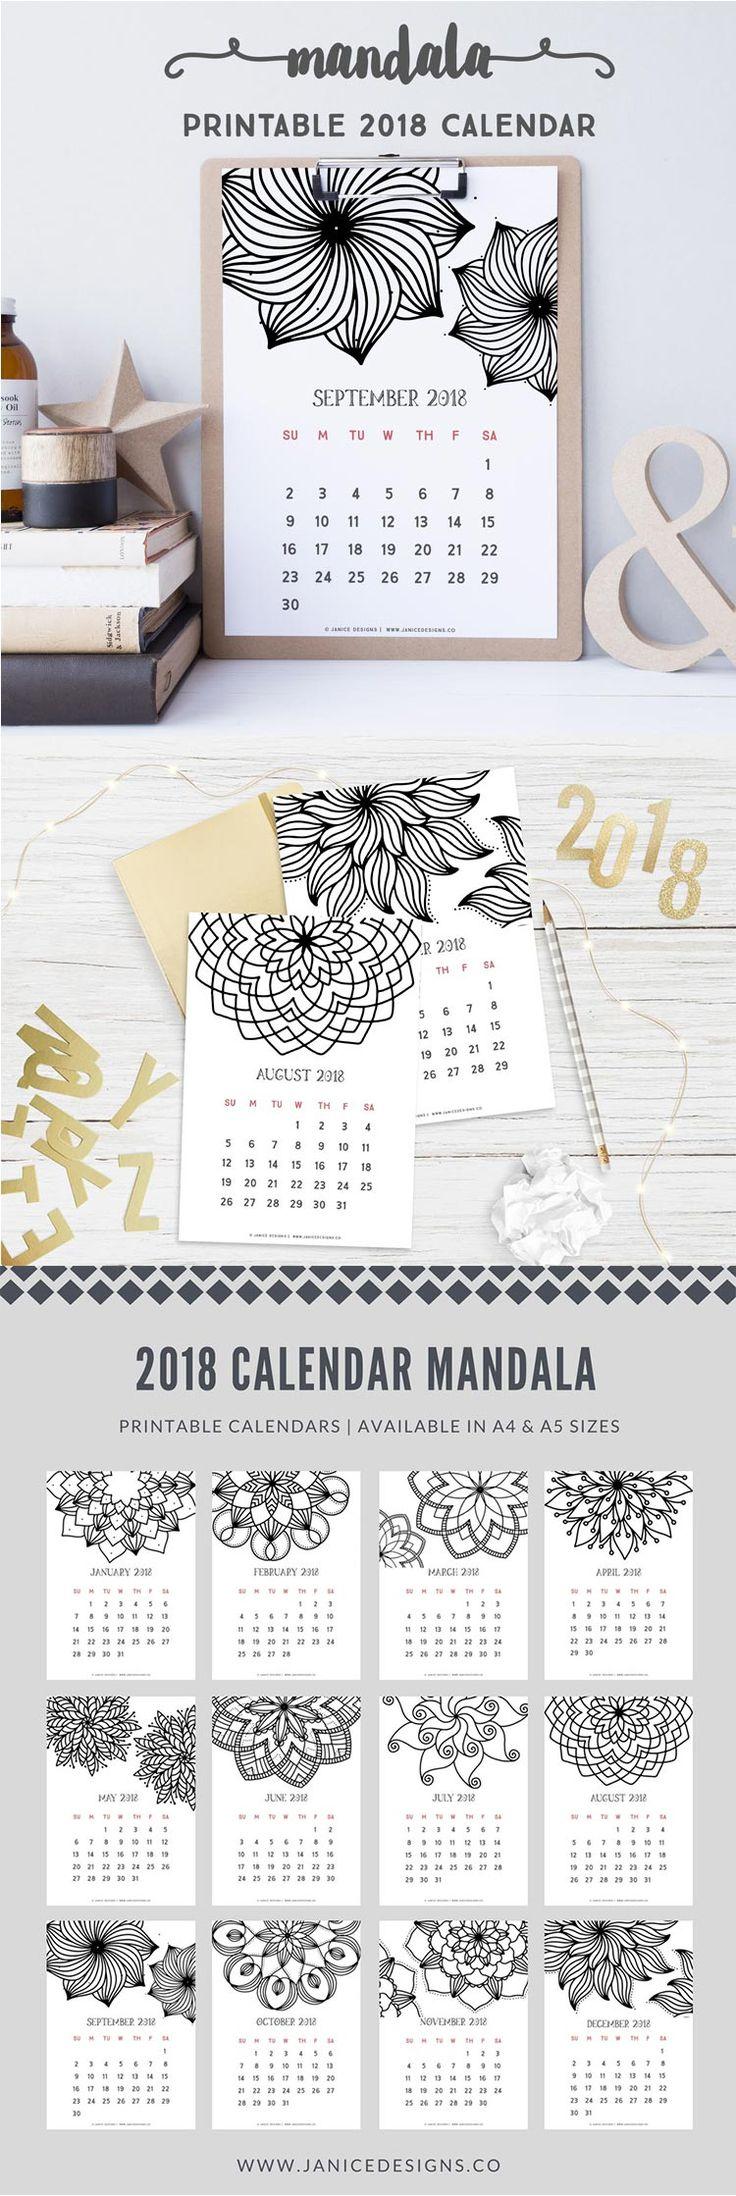 2018 Printable Calendar: Mandala